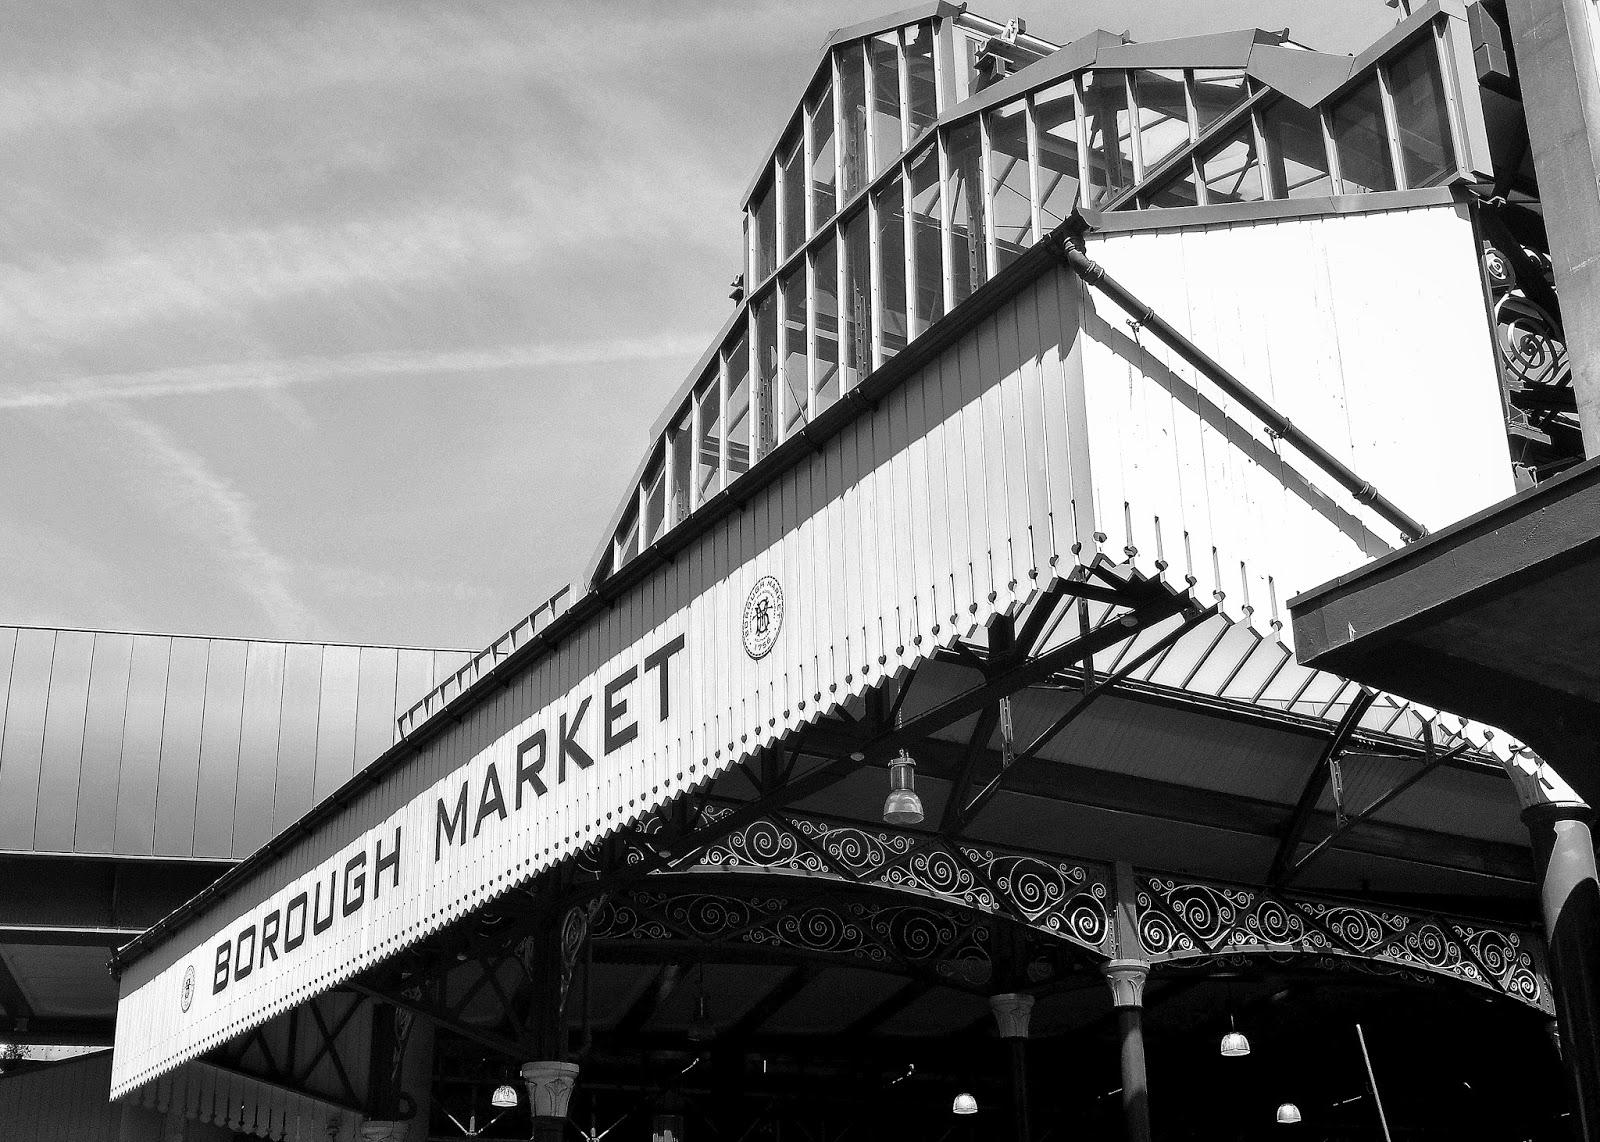 Borough Market, London Bridge - where I am reflecting on the defiant spirit of London and its communities.